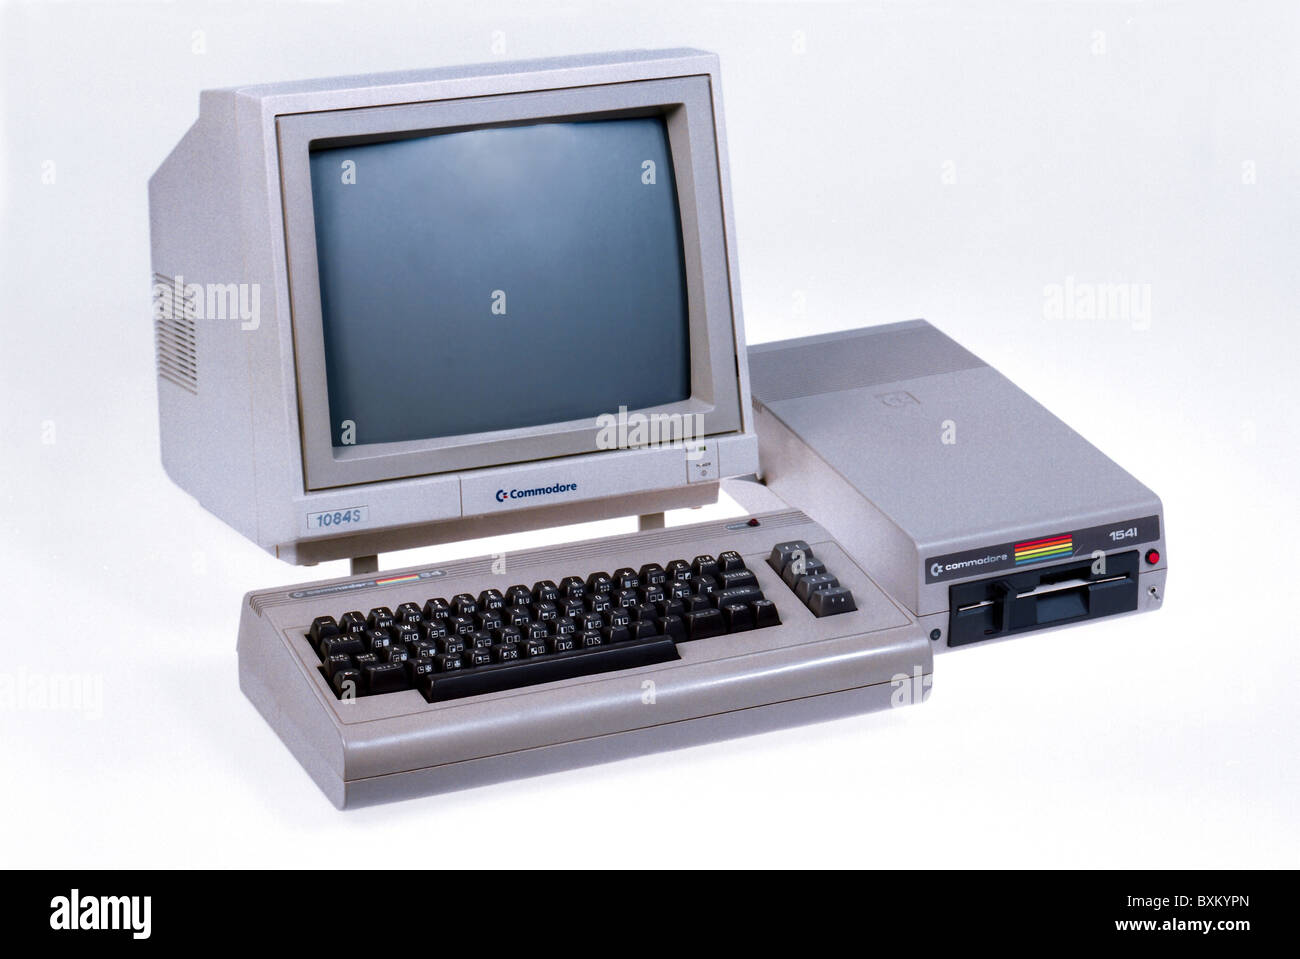 computing / electronics, computer, Commodore C64, 1982, 1980s, 80s, 20th century, historic, historical, C 64 Homecomputer, - Stock Image